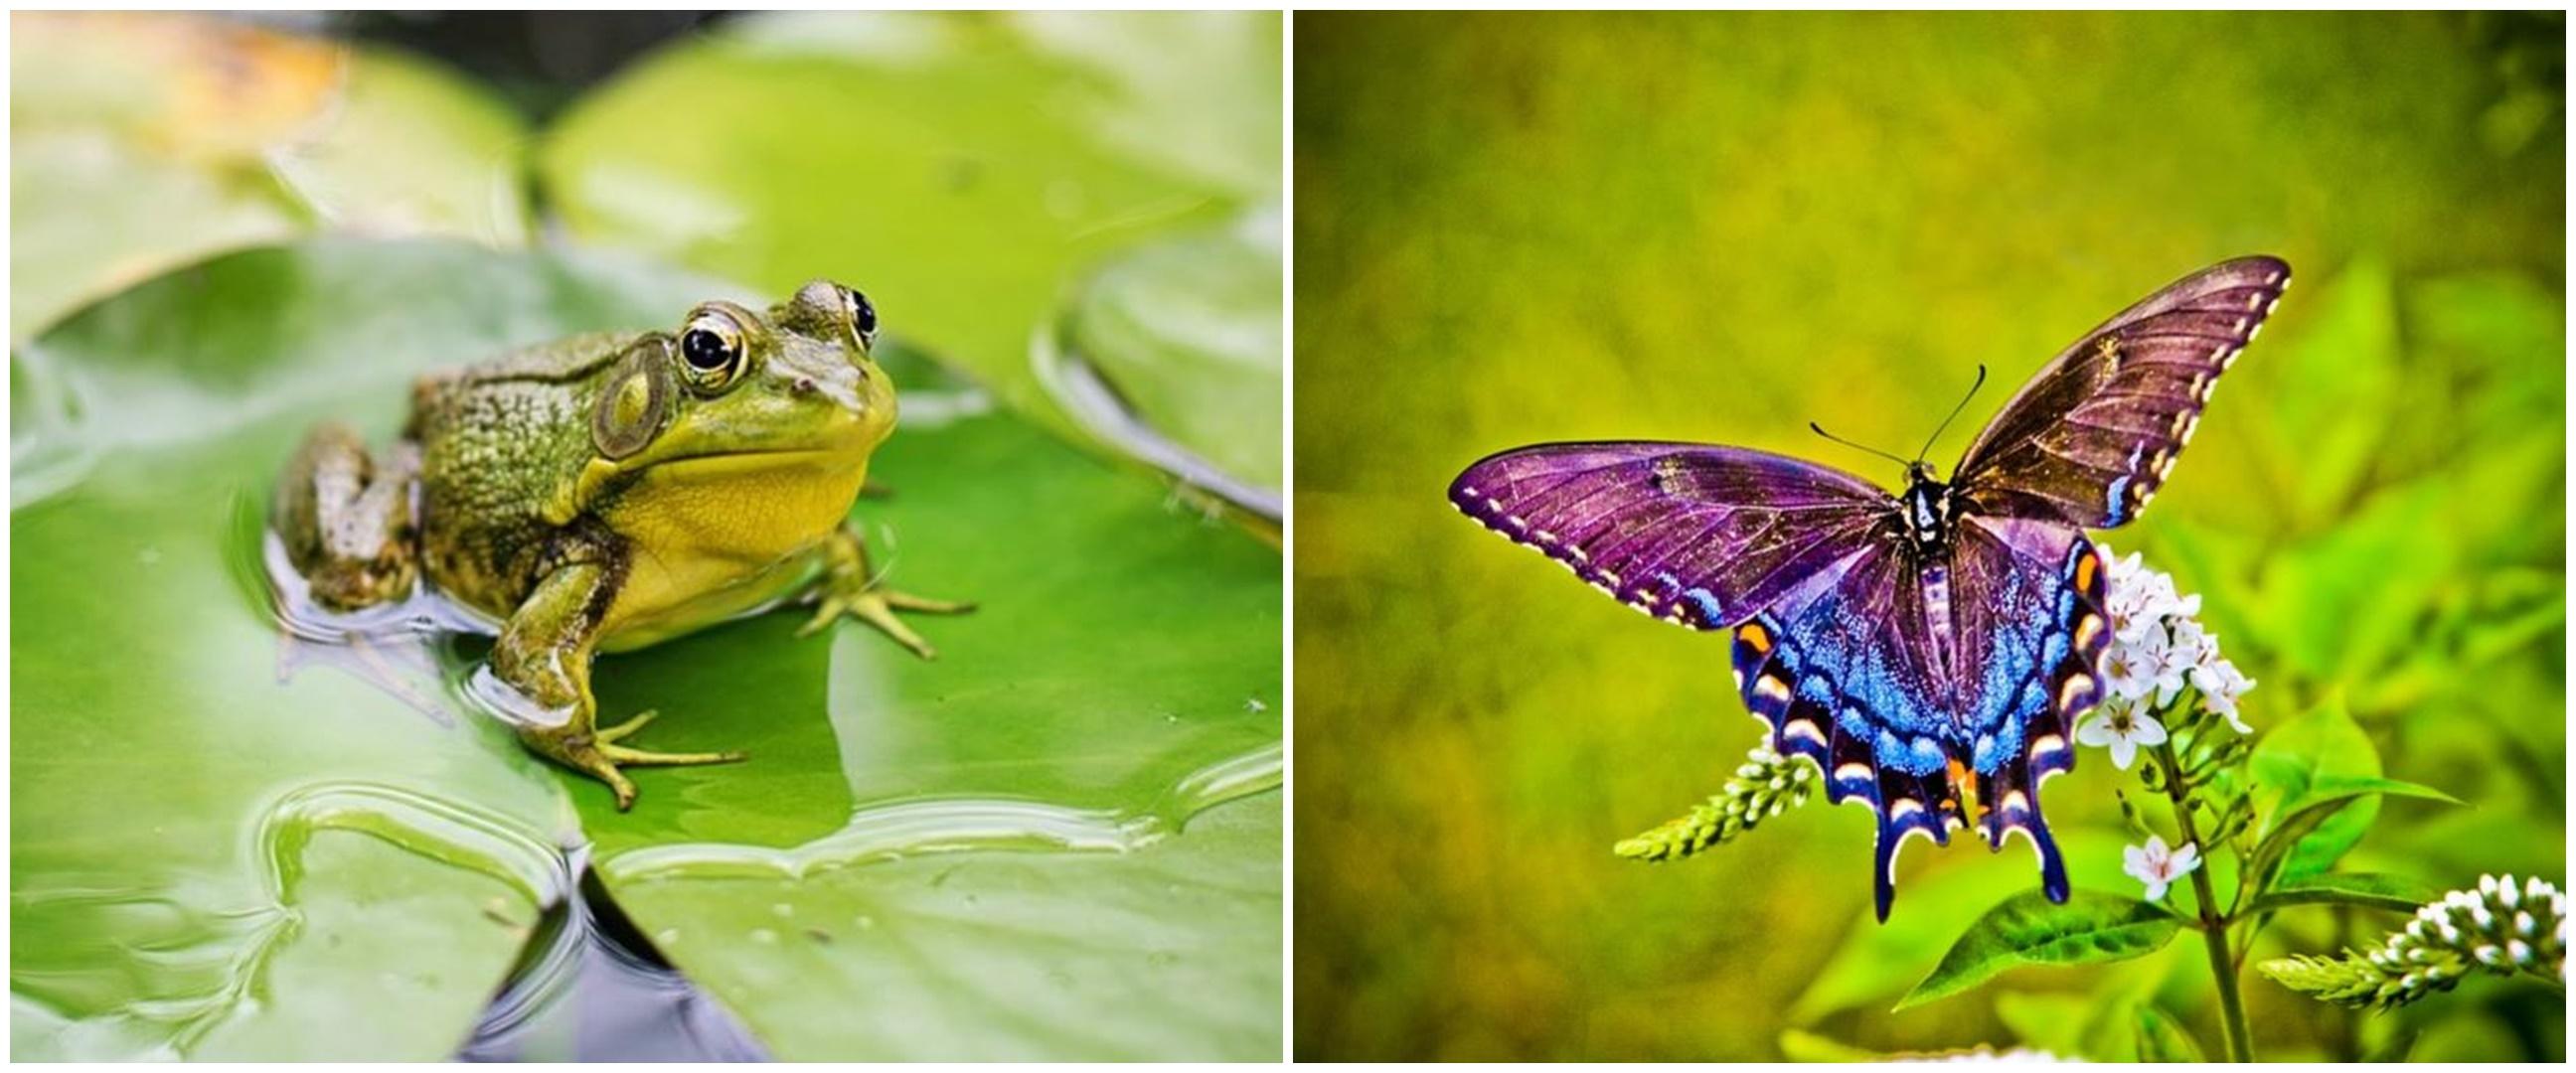 Pengertian metamorfosis sempurna, ciri-ciri dan contohnya